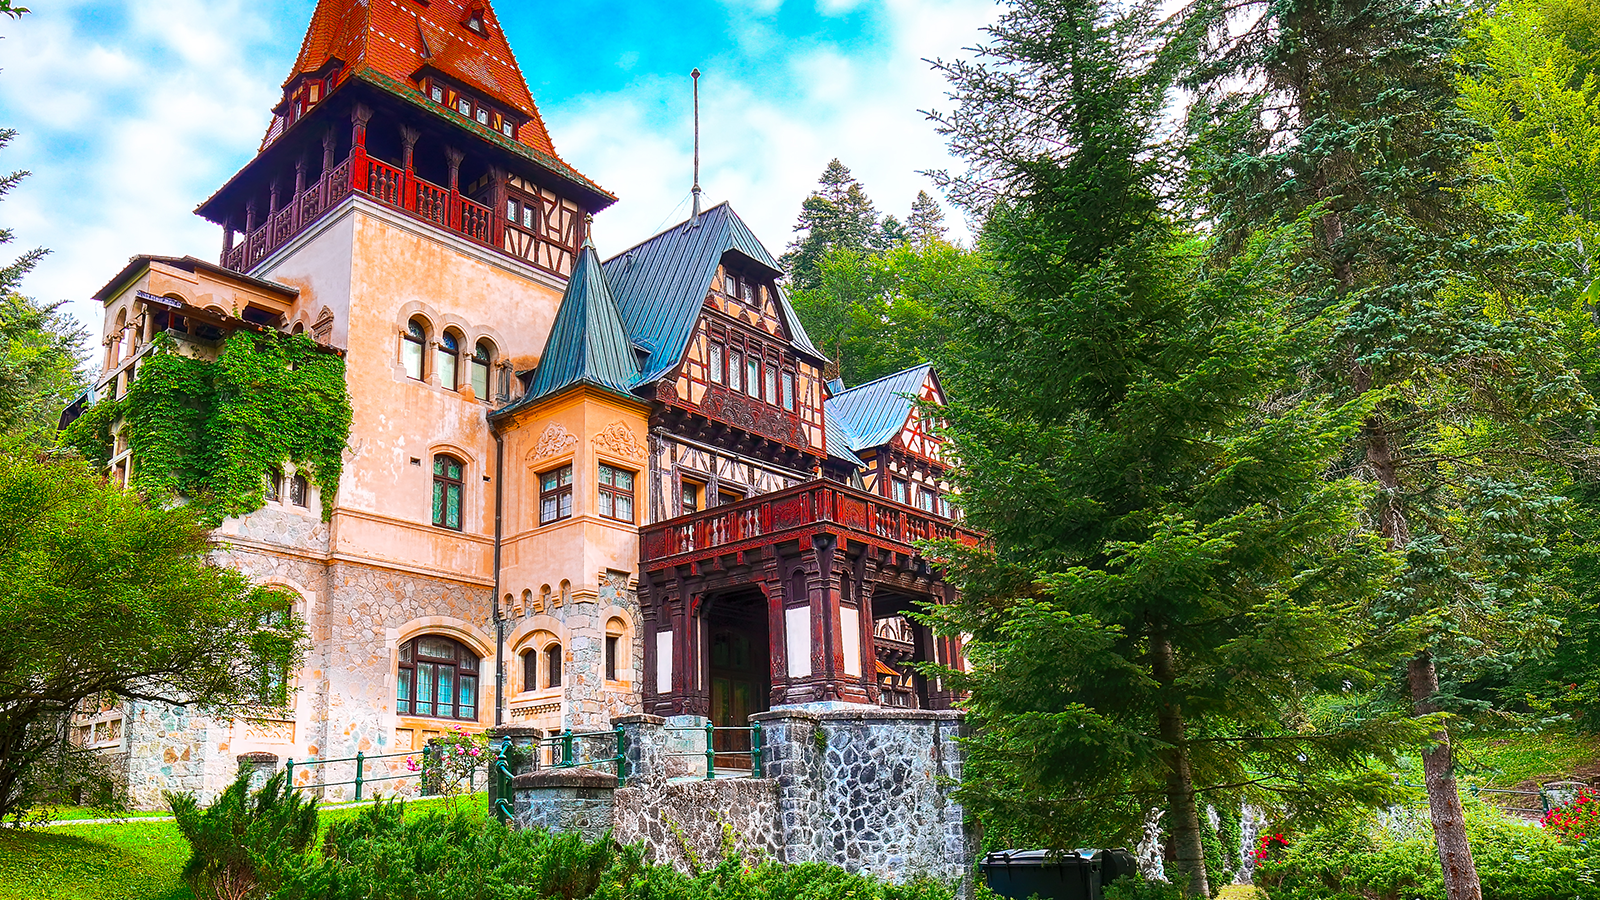 Roménia - Castelo de Bran